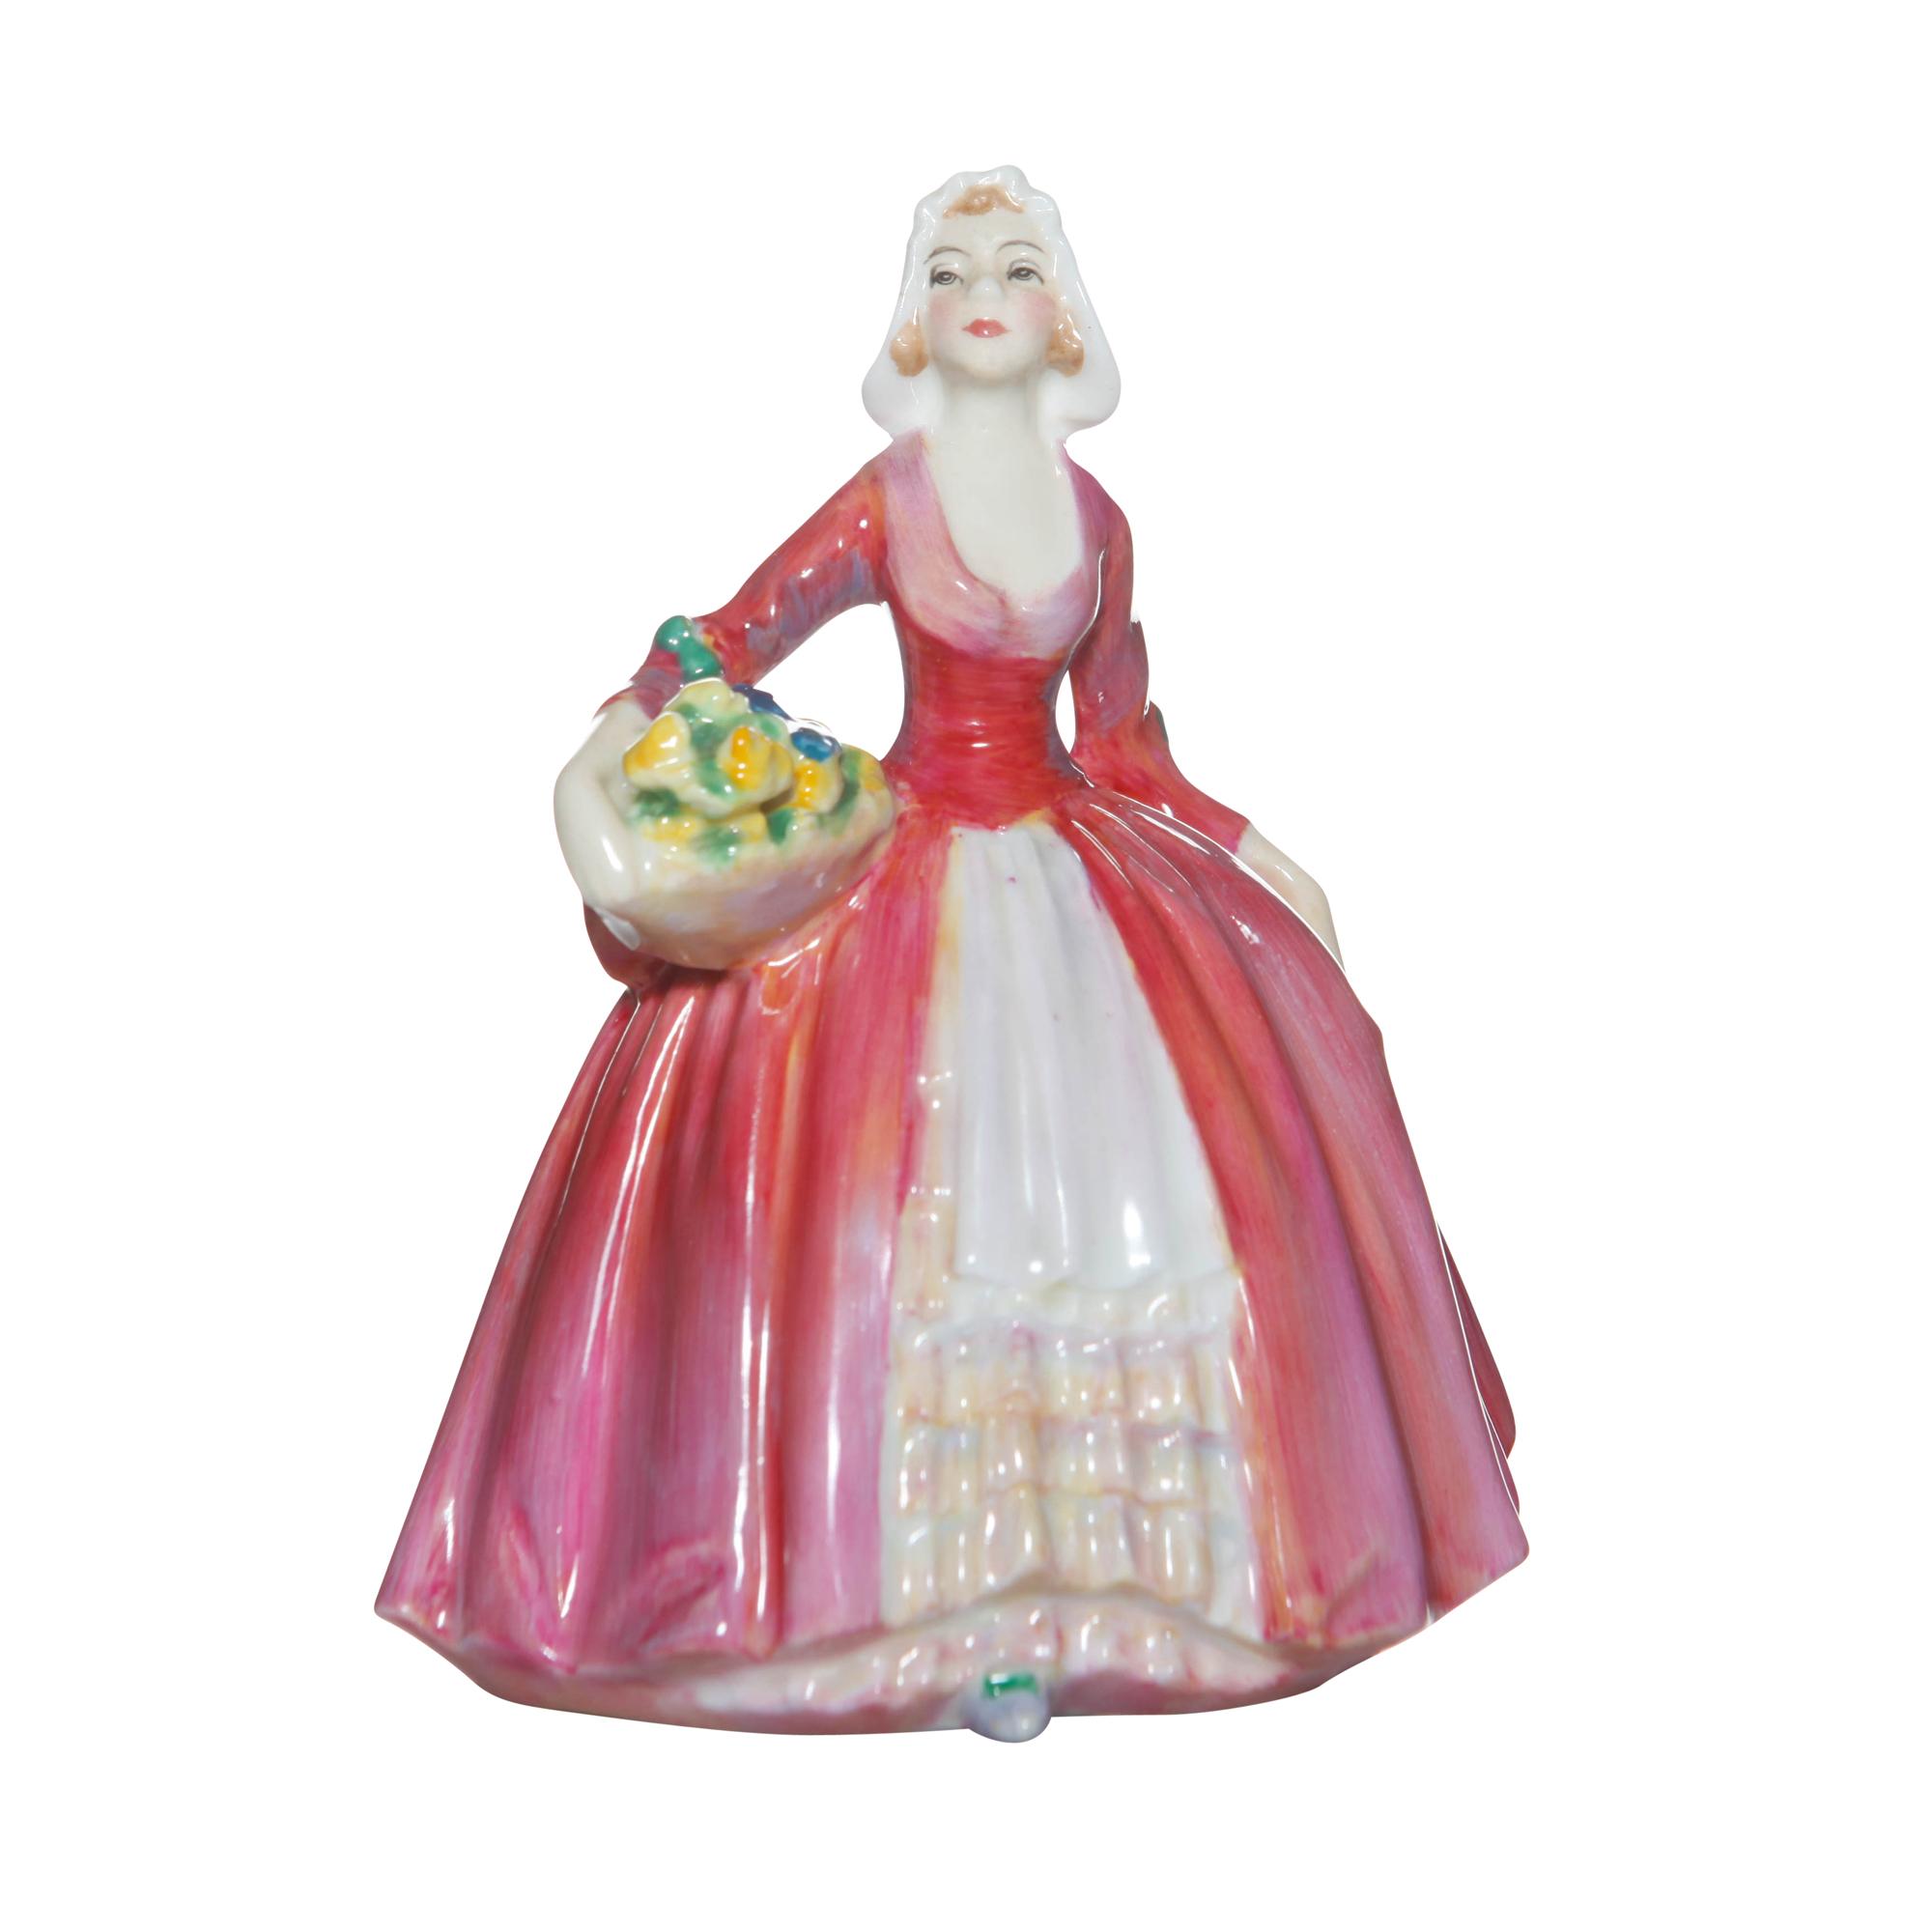 Janet HN1964 - Royal Doulton Figurine